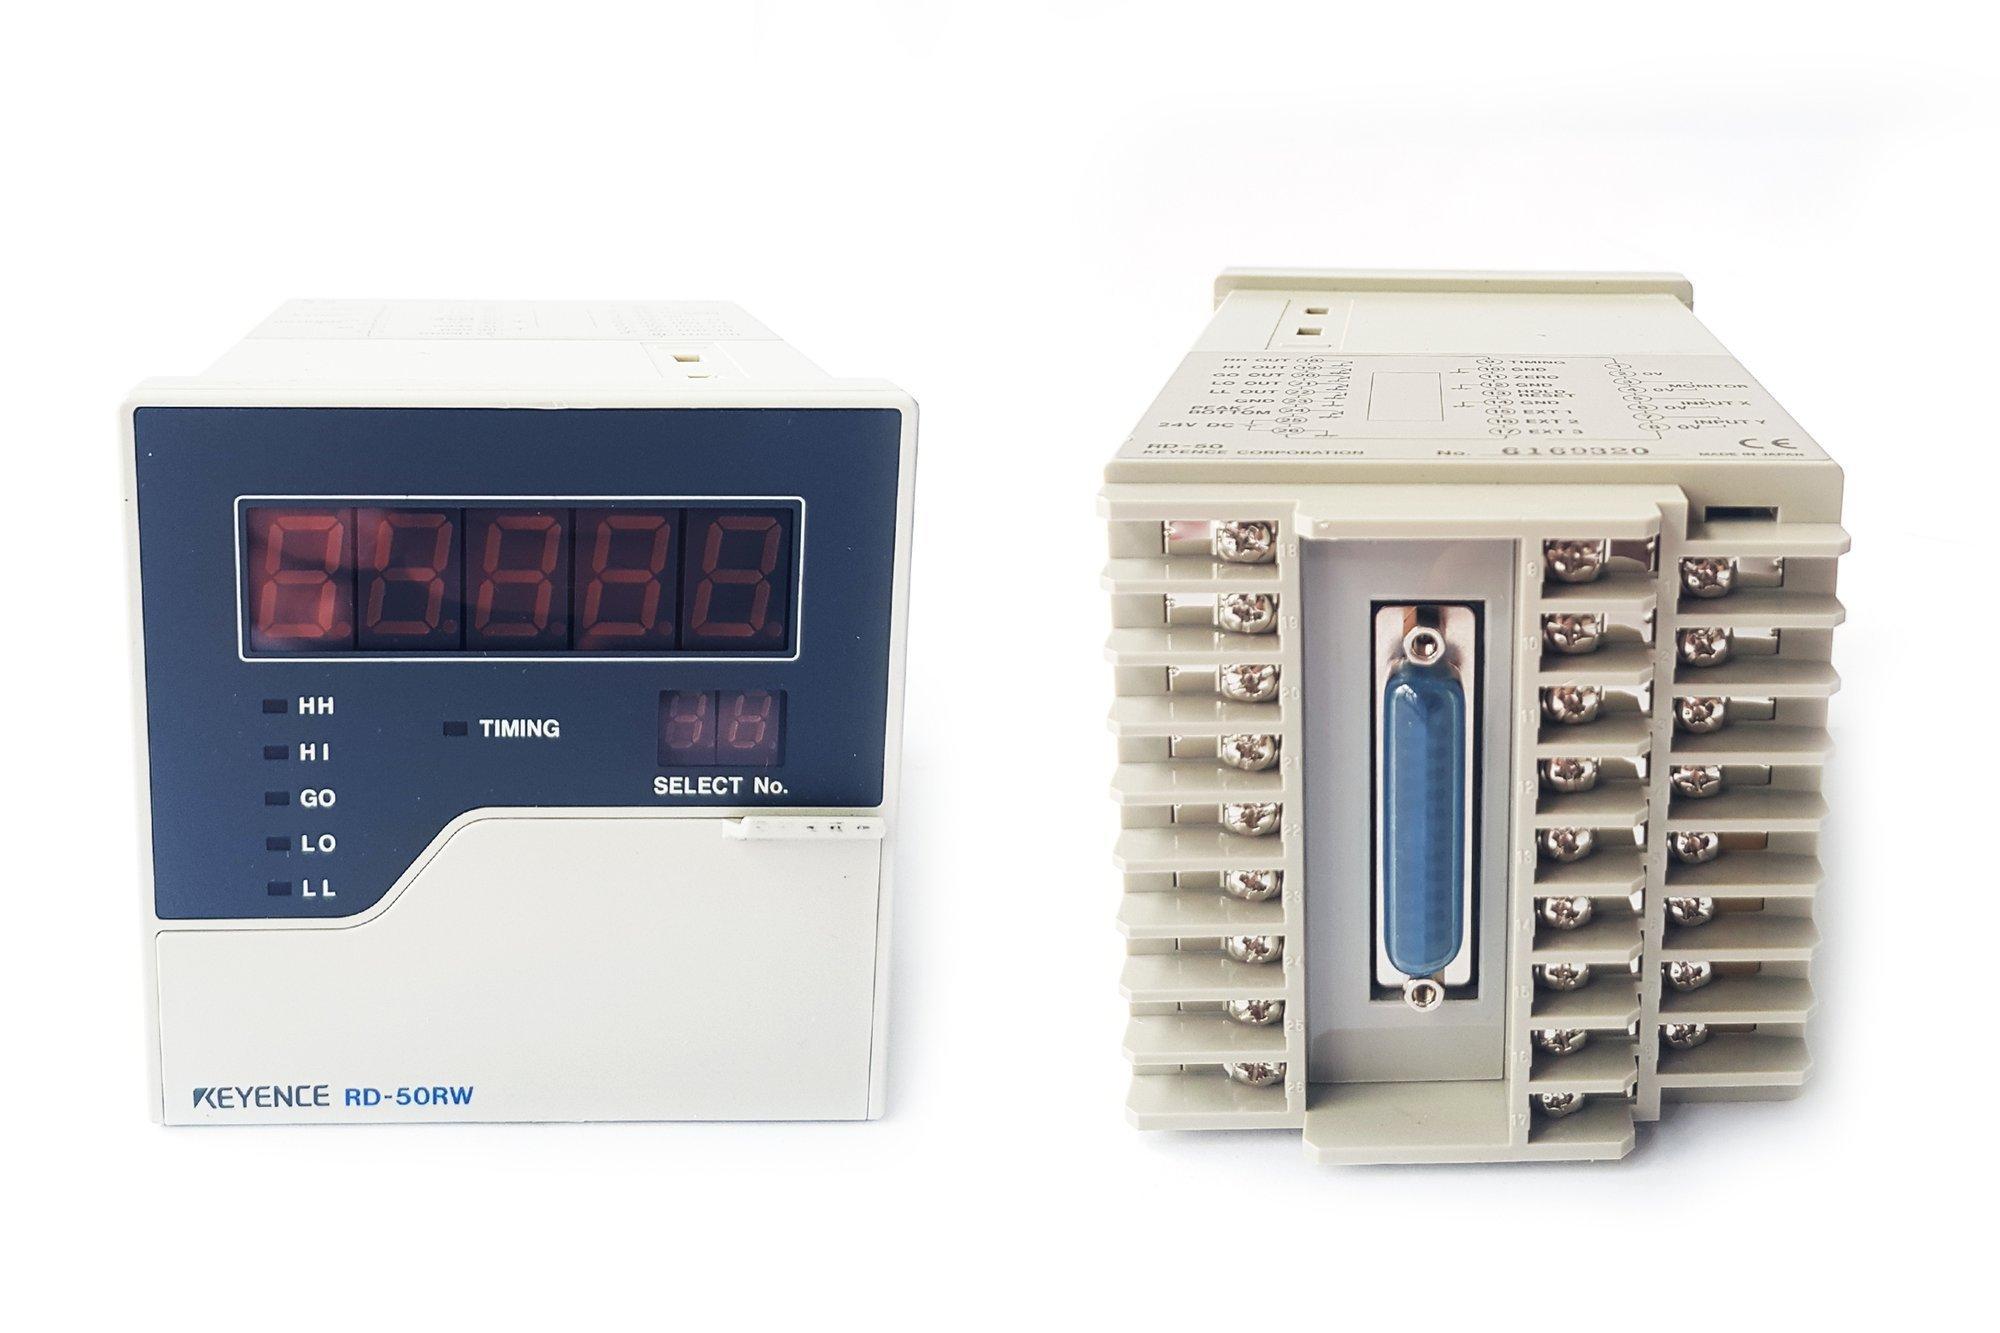 Keyence Analogue Sensor Controller Main Unit, RS-232C Type - RD-50RW